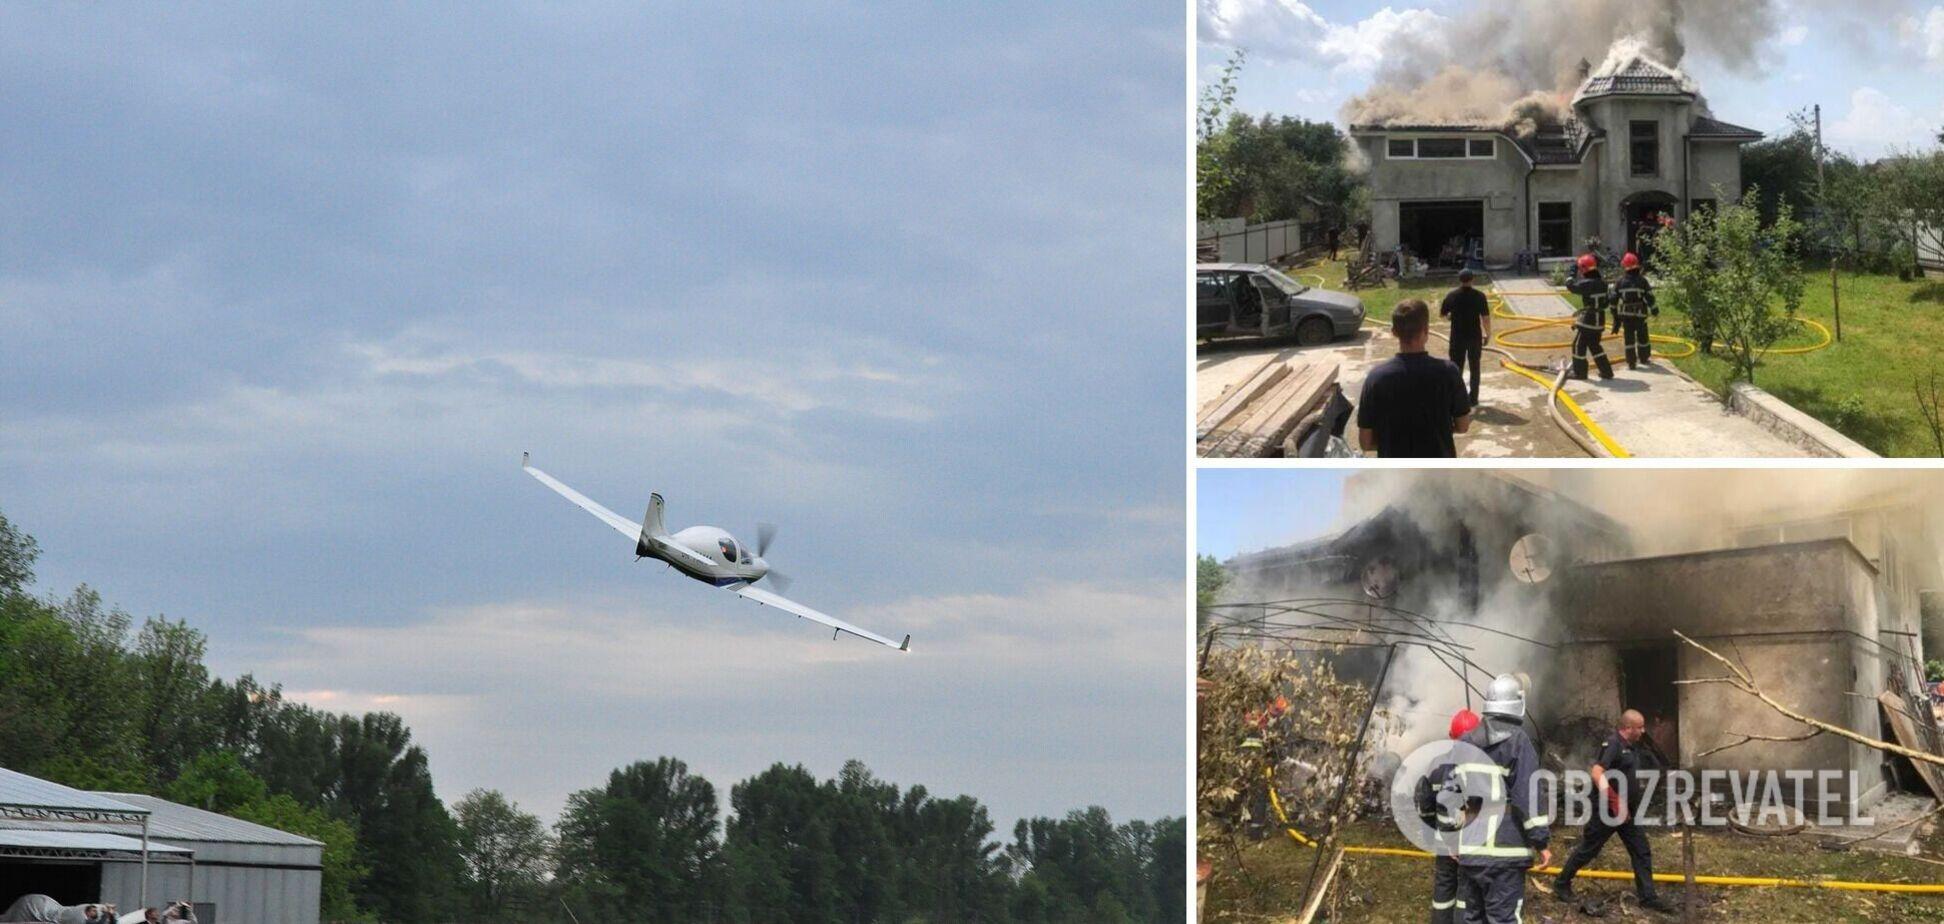 Авиакатастрофа на Прикарпатье: момент падения самолета попал на видео